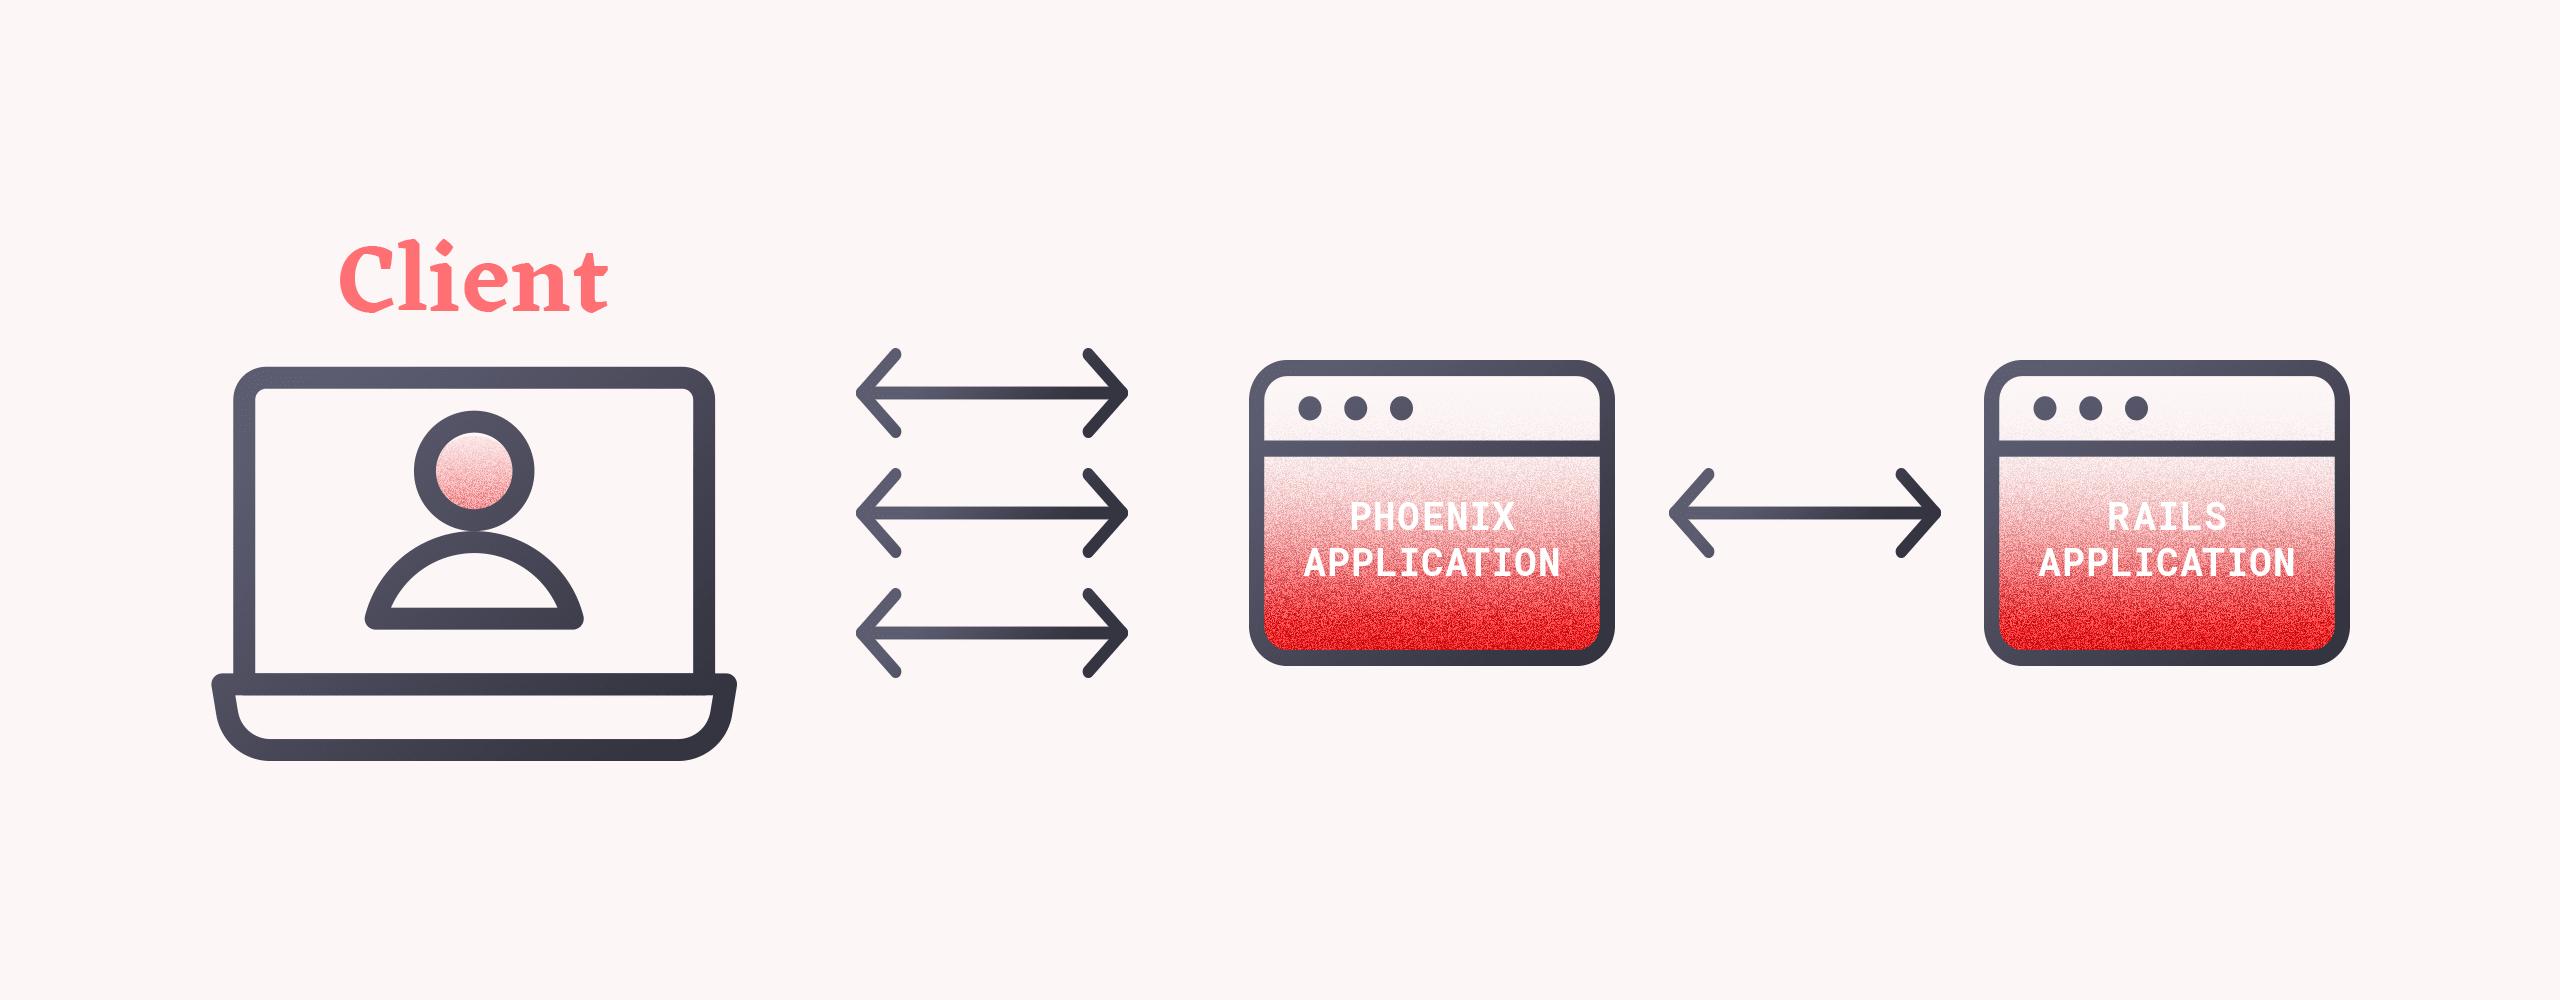 API client request handling in Phoenix-Elixir system